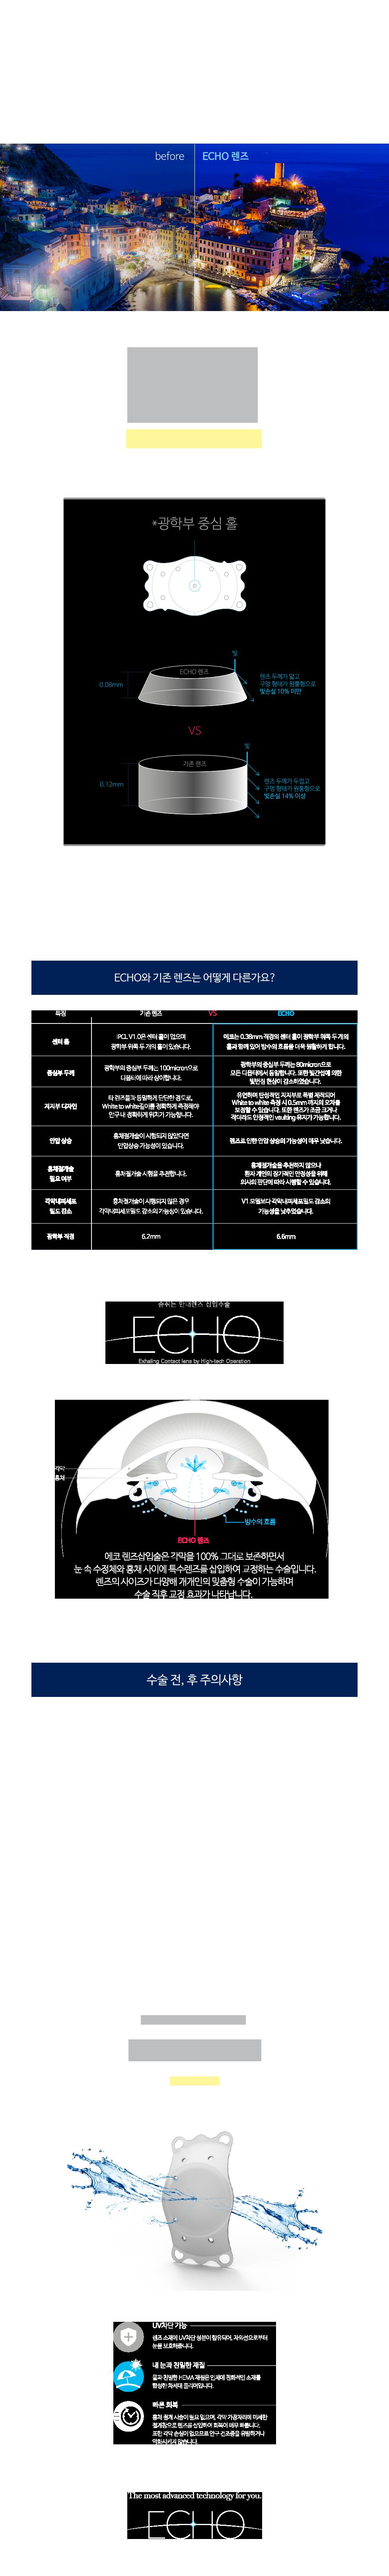 ECHO5.png